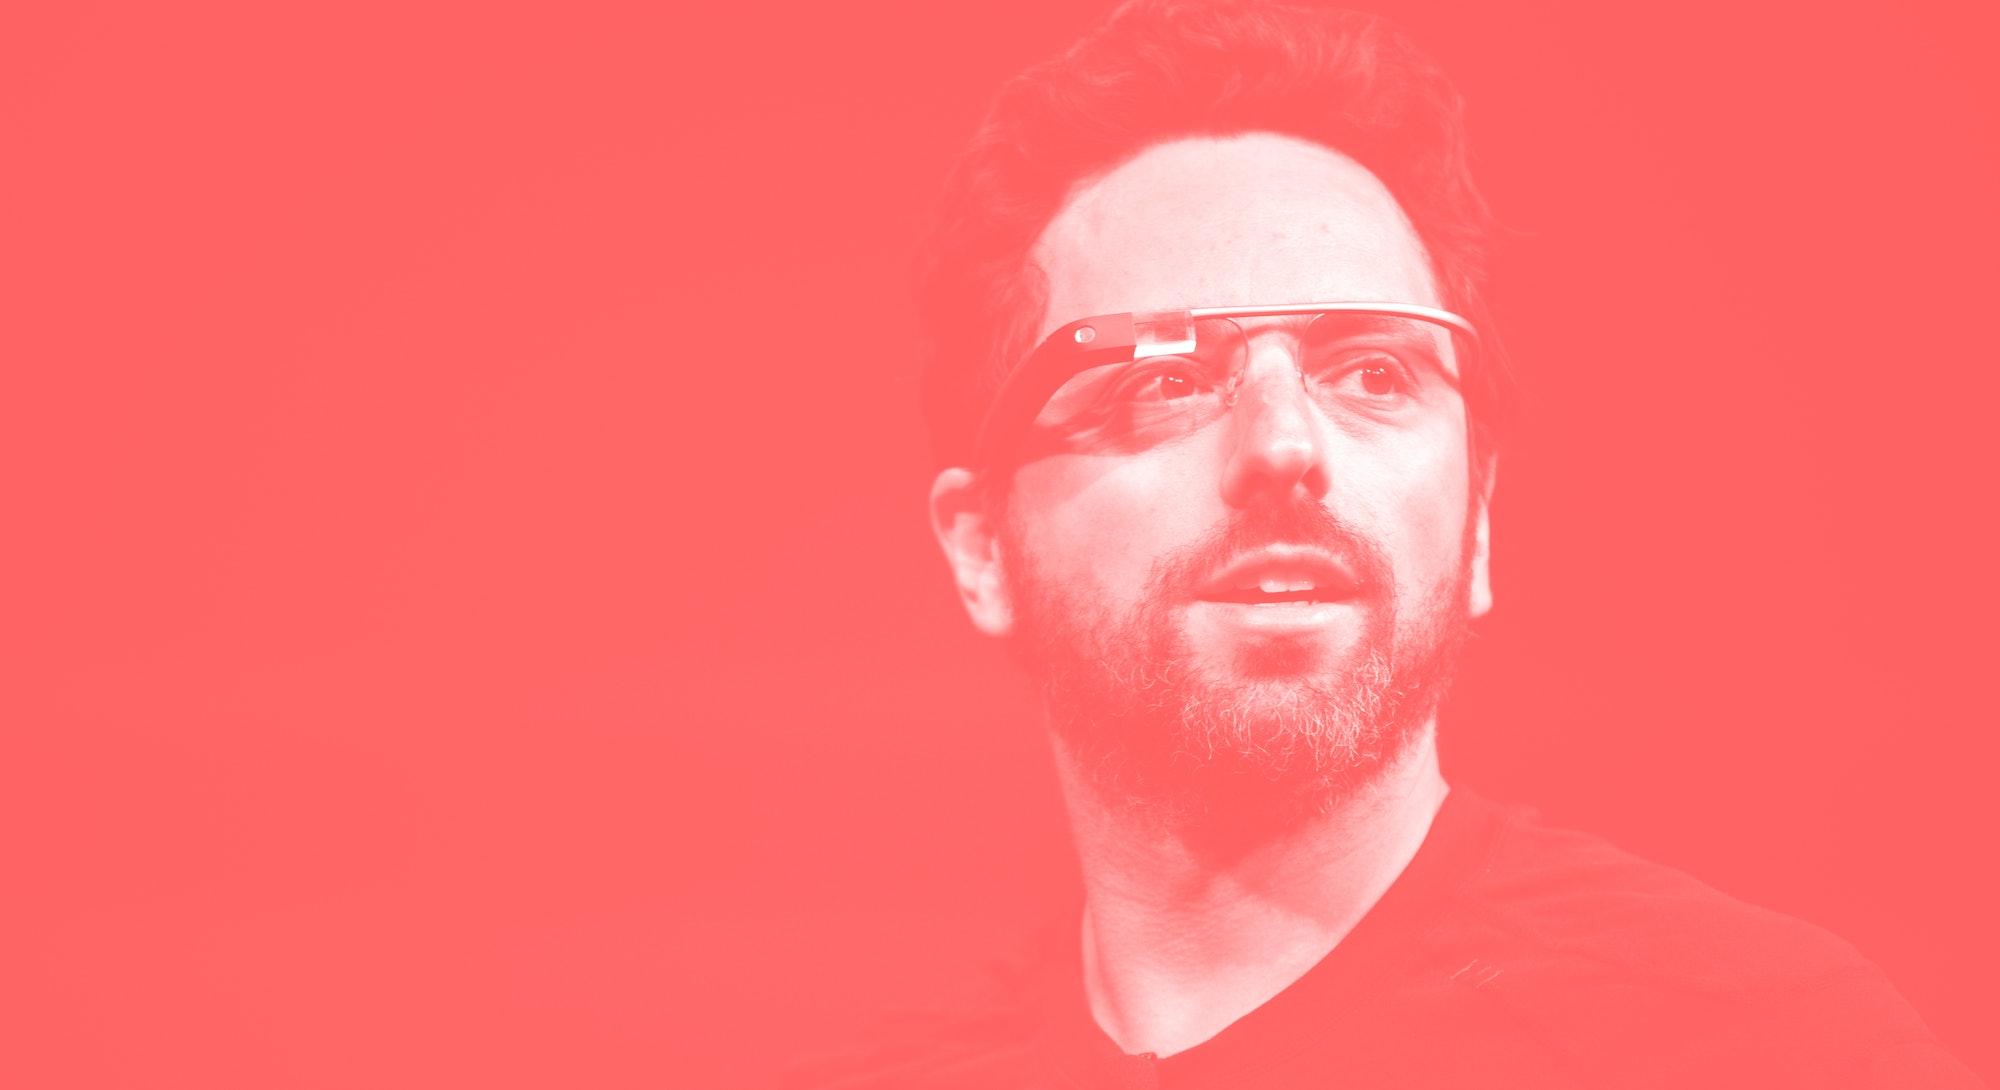 The Google Glass headset.